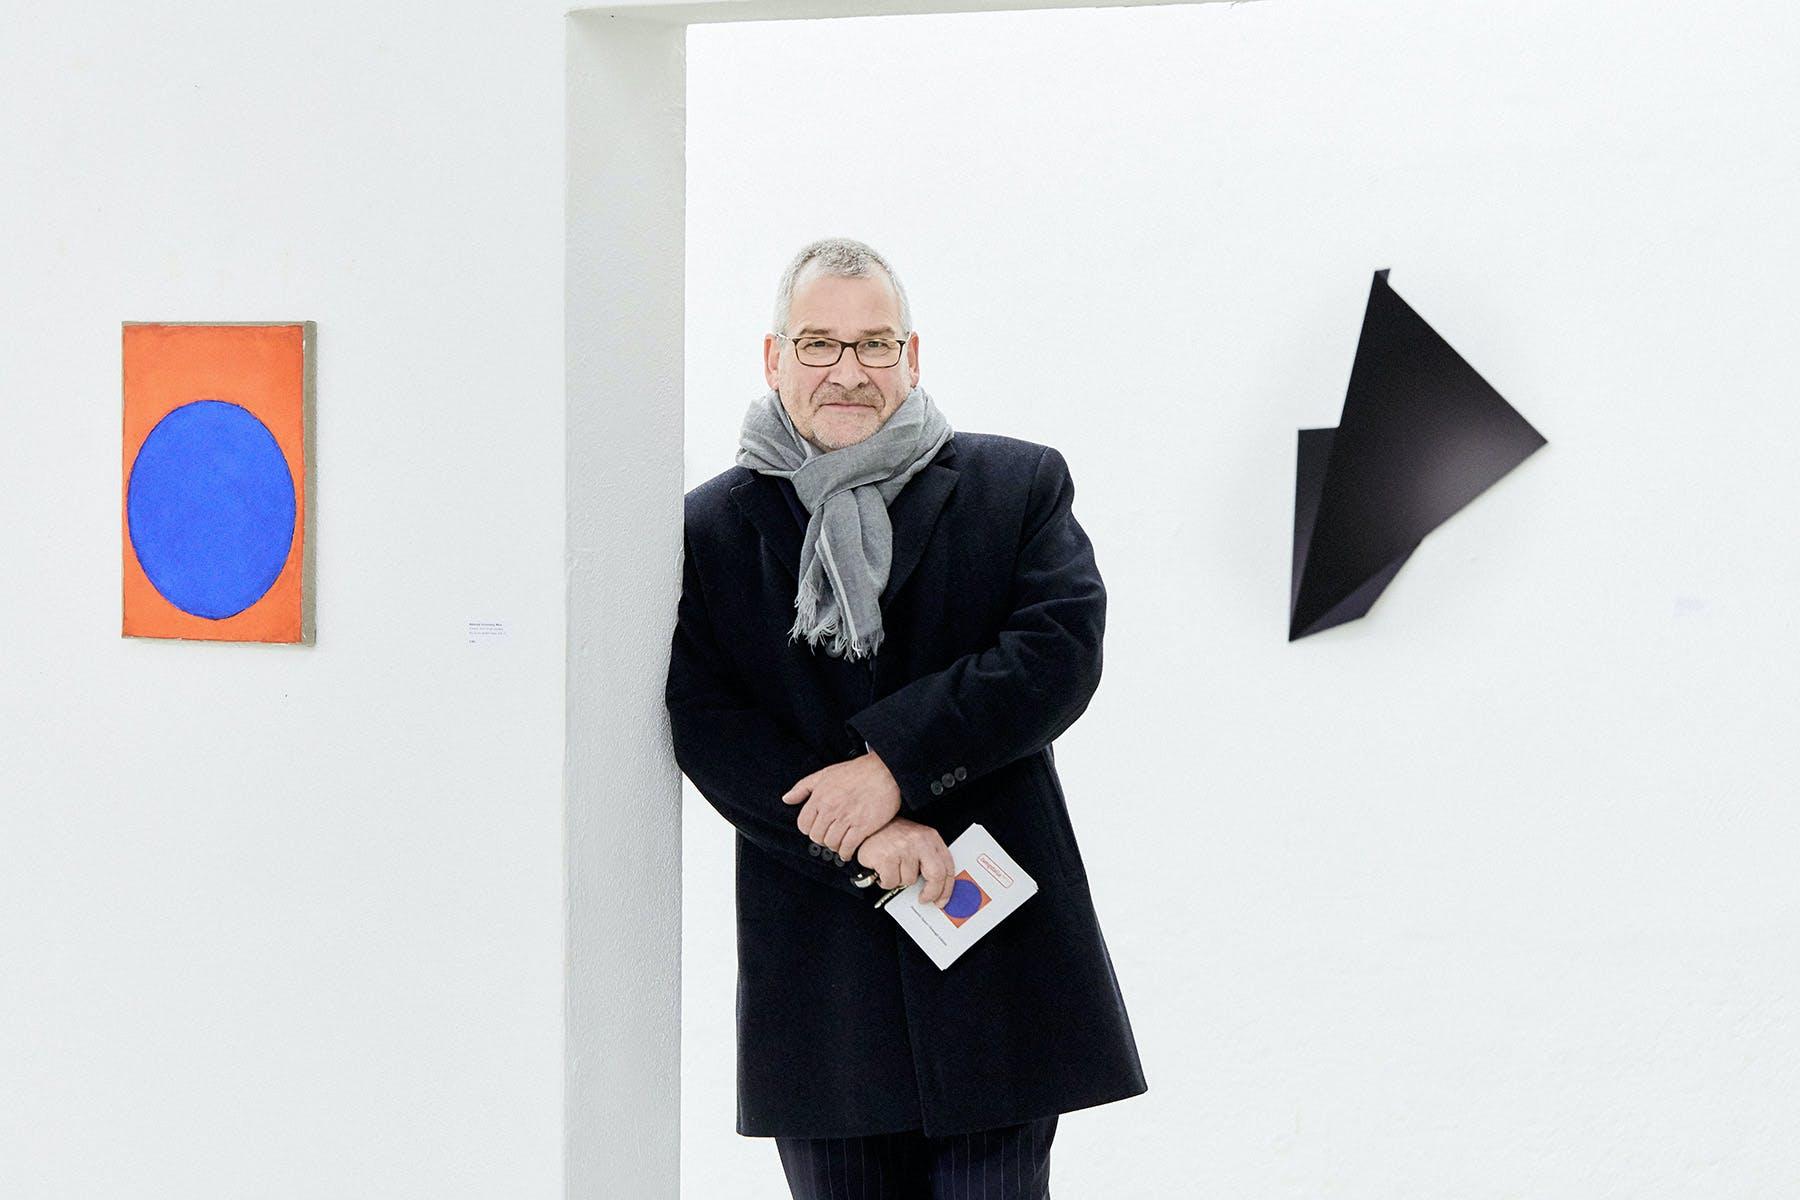 Unser Interviewpartner Andreas Stucken | Foto: © Anja Behrens